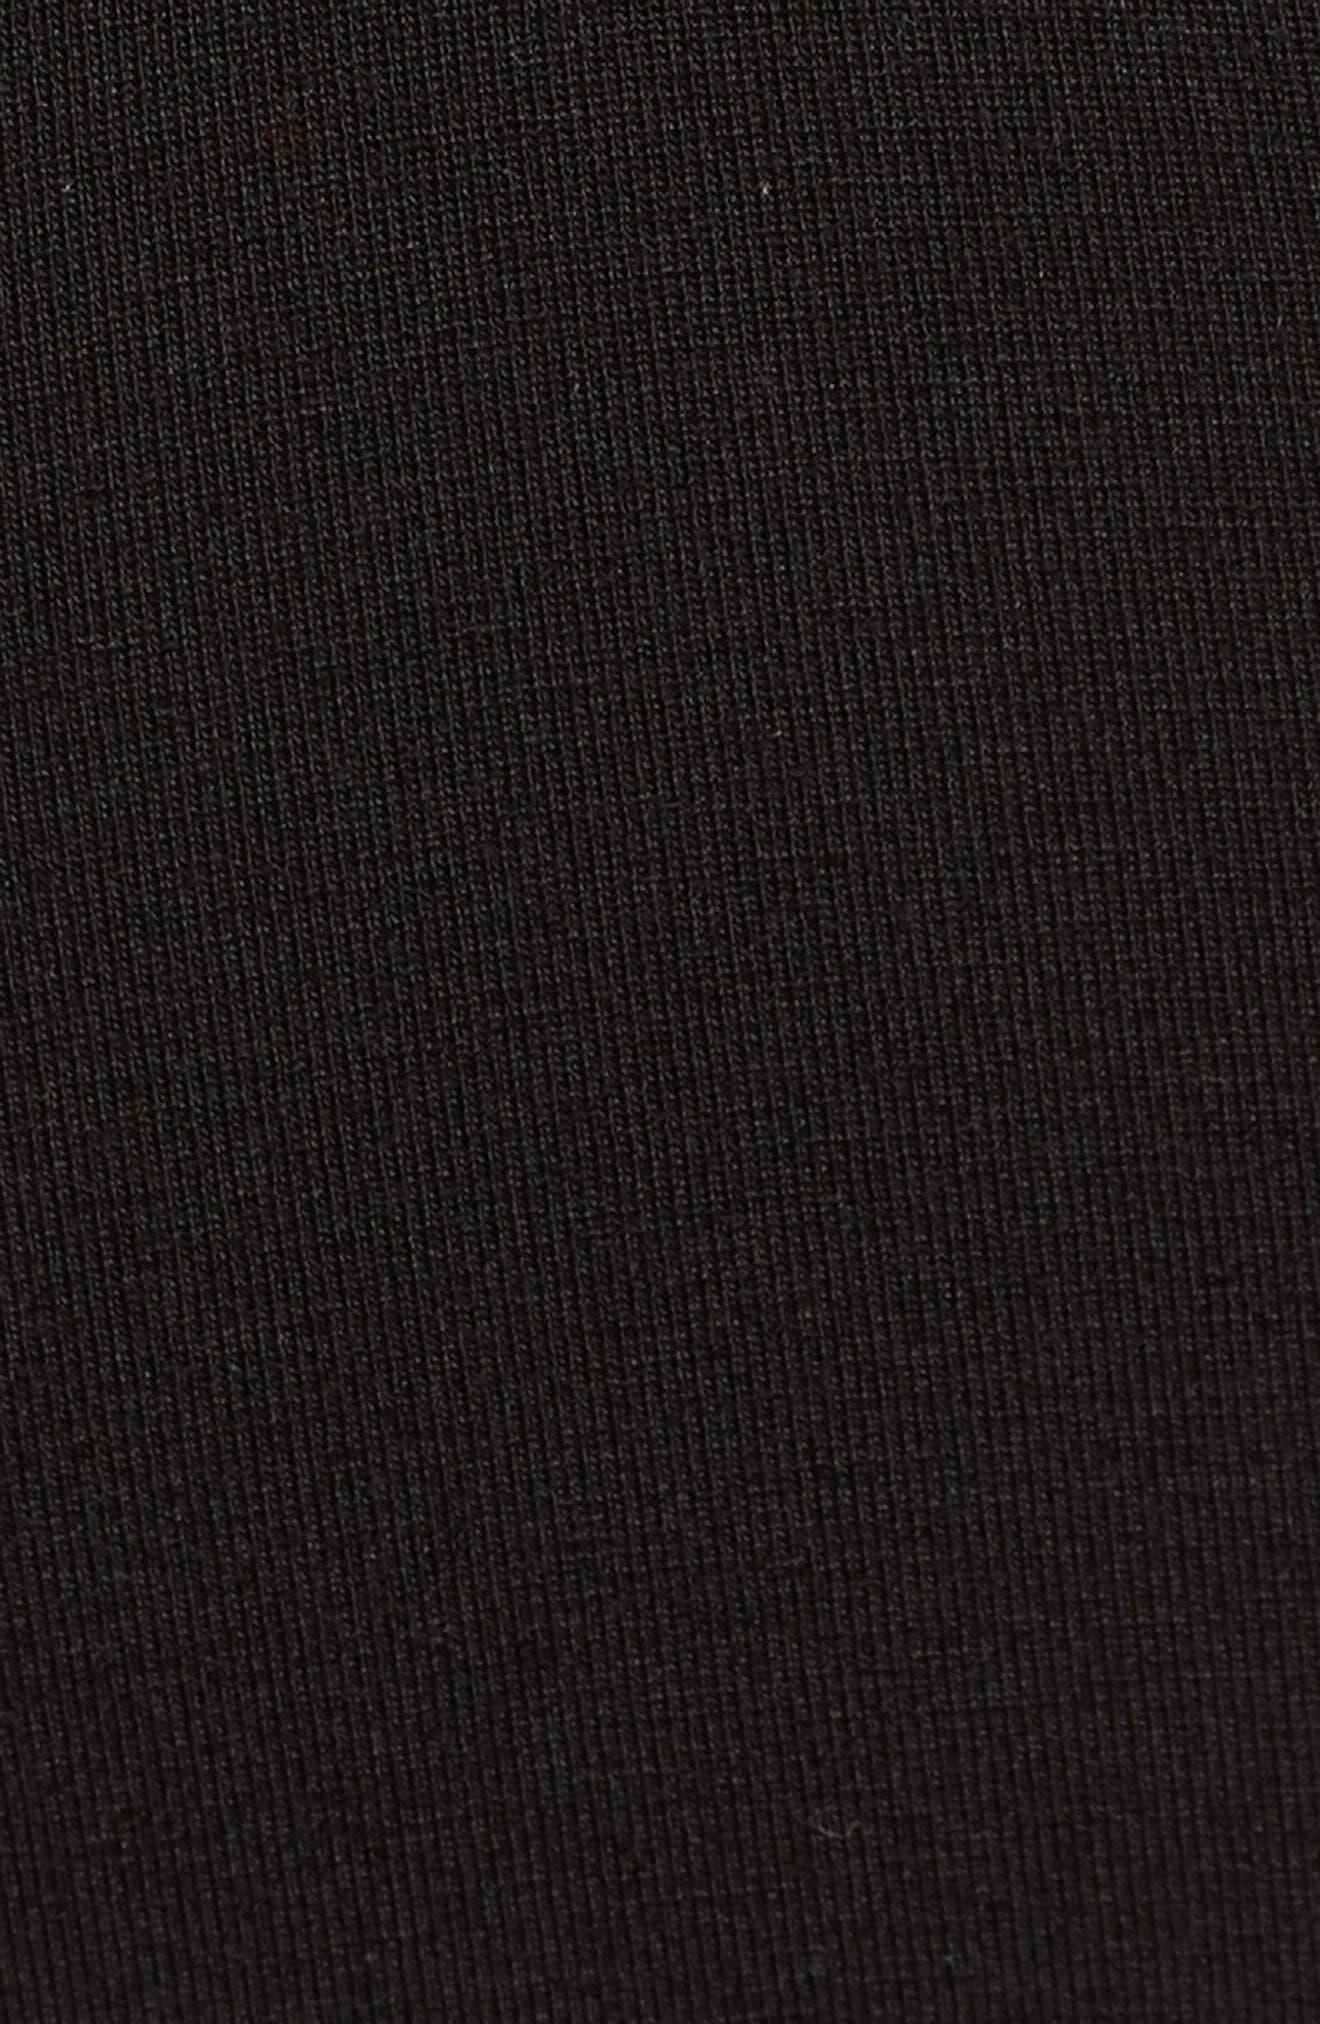 Shadow Logo Sports Bra,                             Alternate thumbnail 7, color,                             001